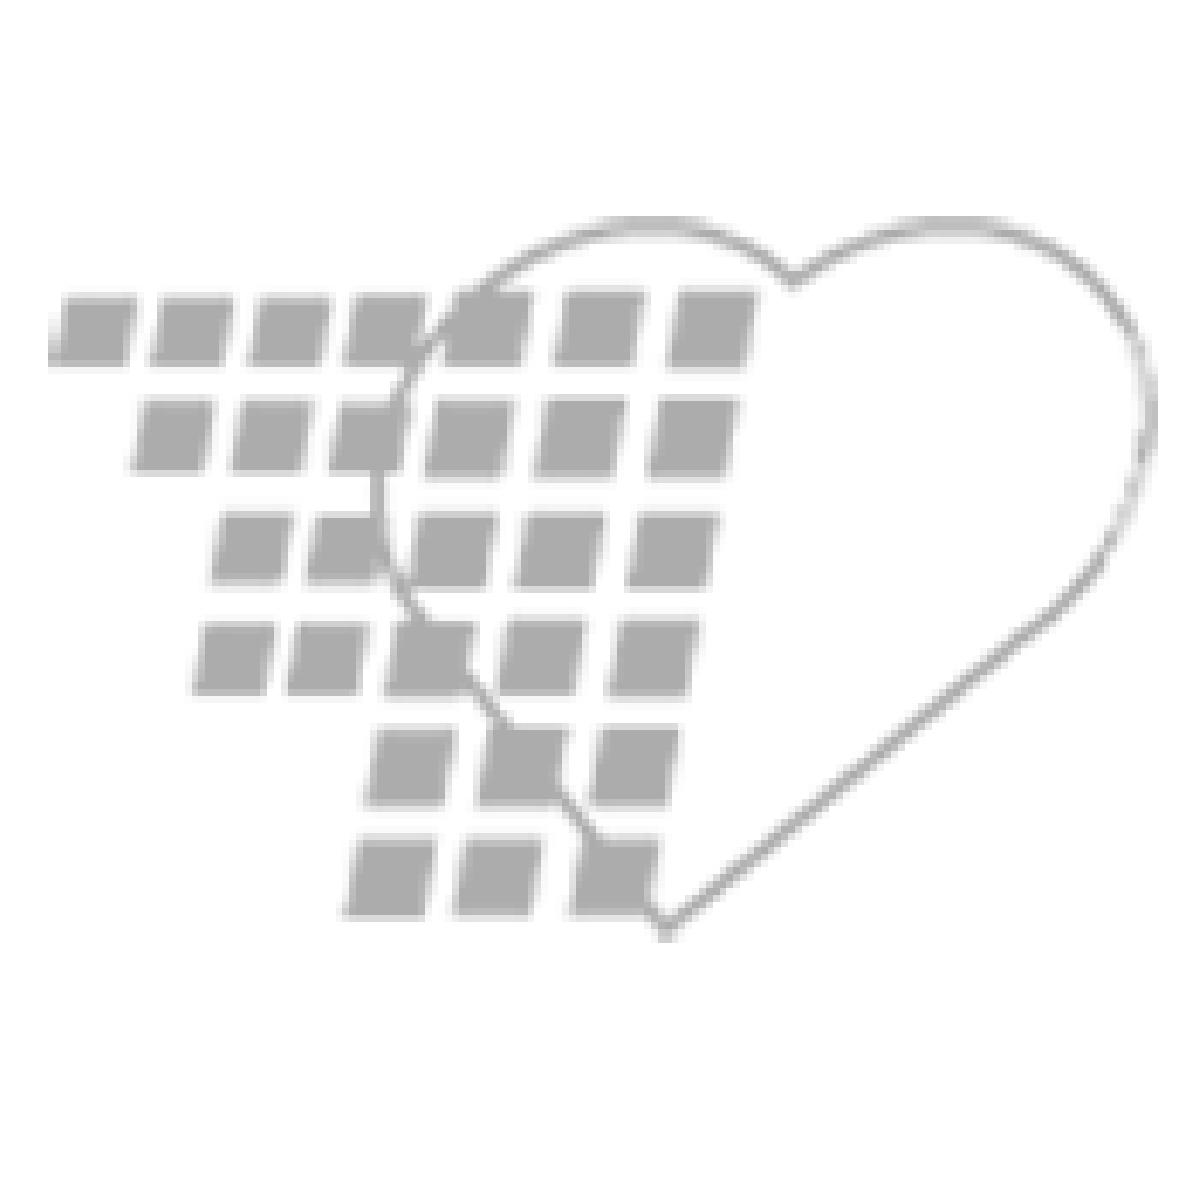 11-81-2304-WH Gaumard Breast Palpation Simulator